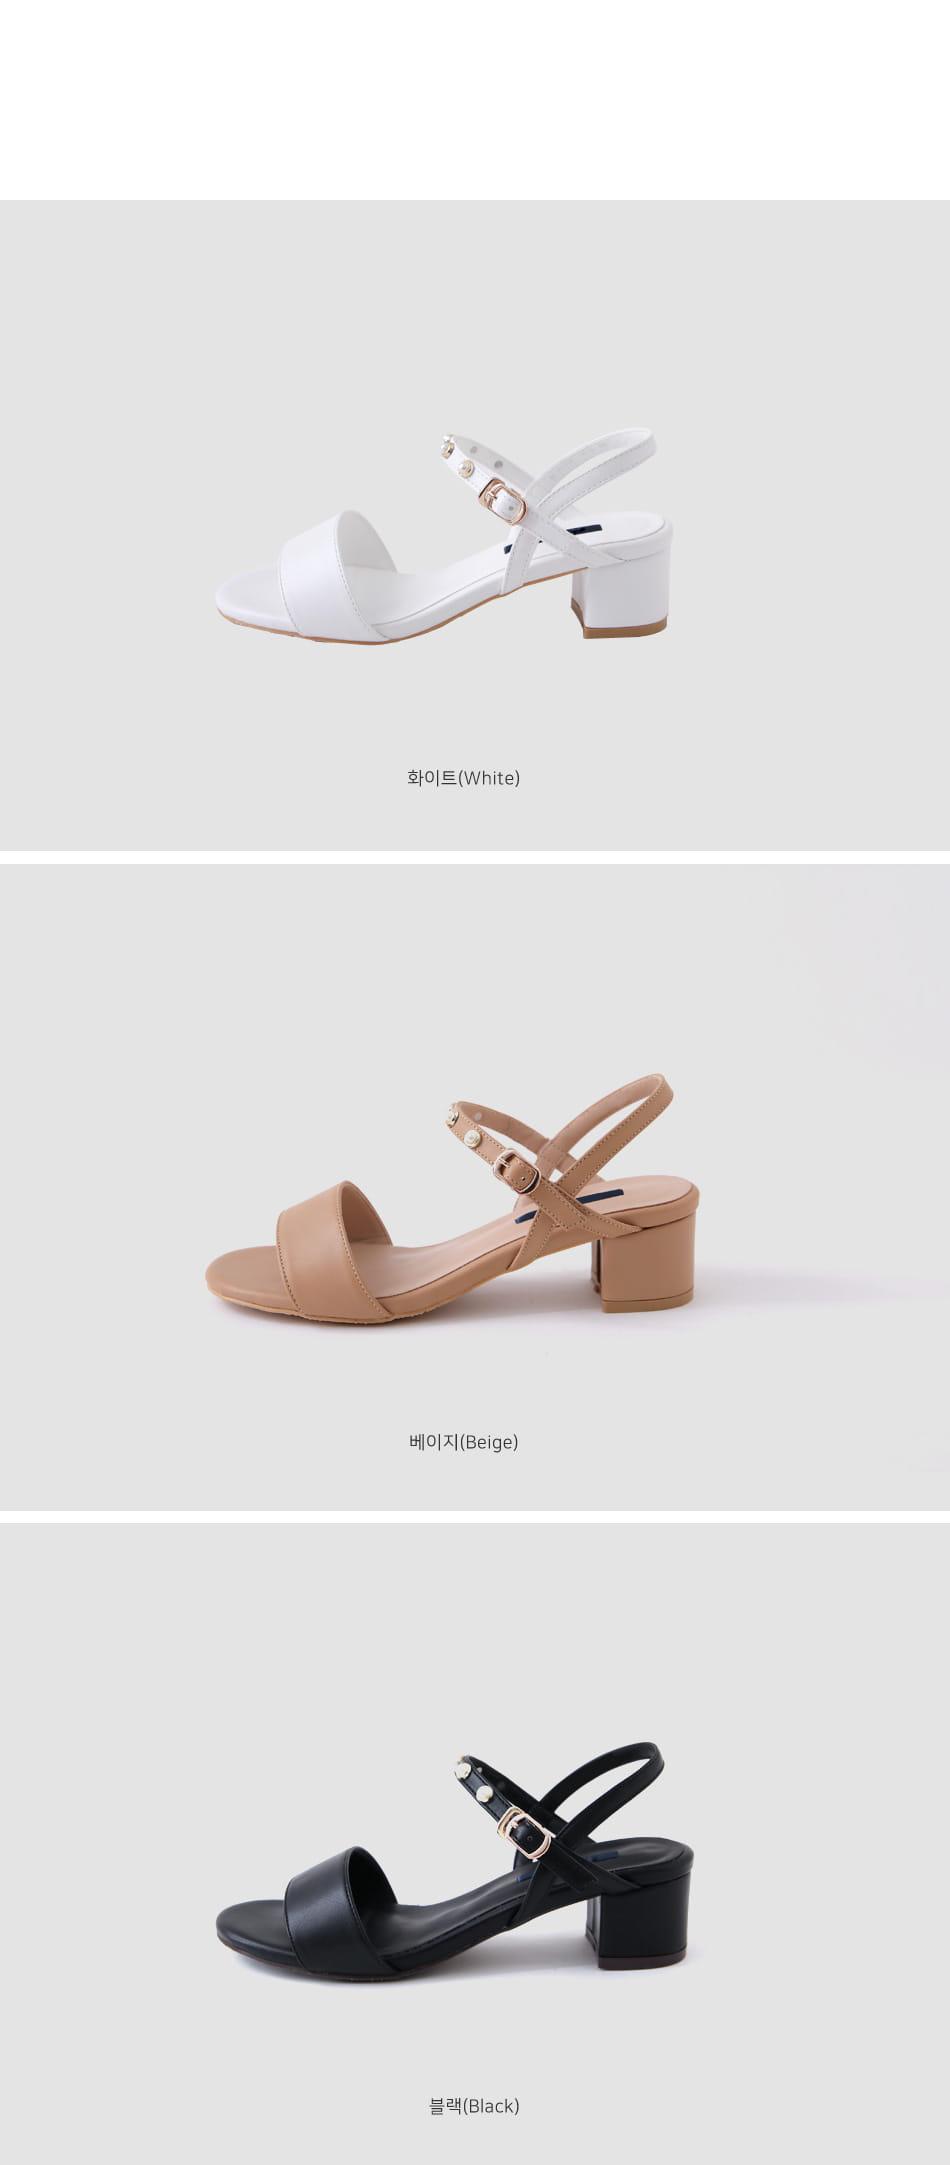 Rezoron strap sandals 4.5cm heel